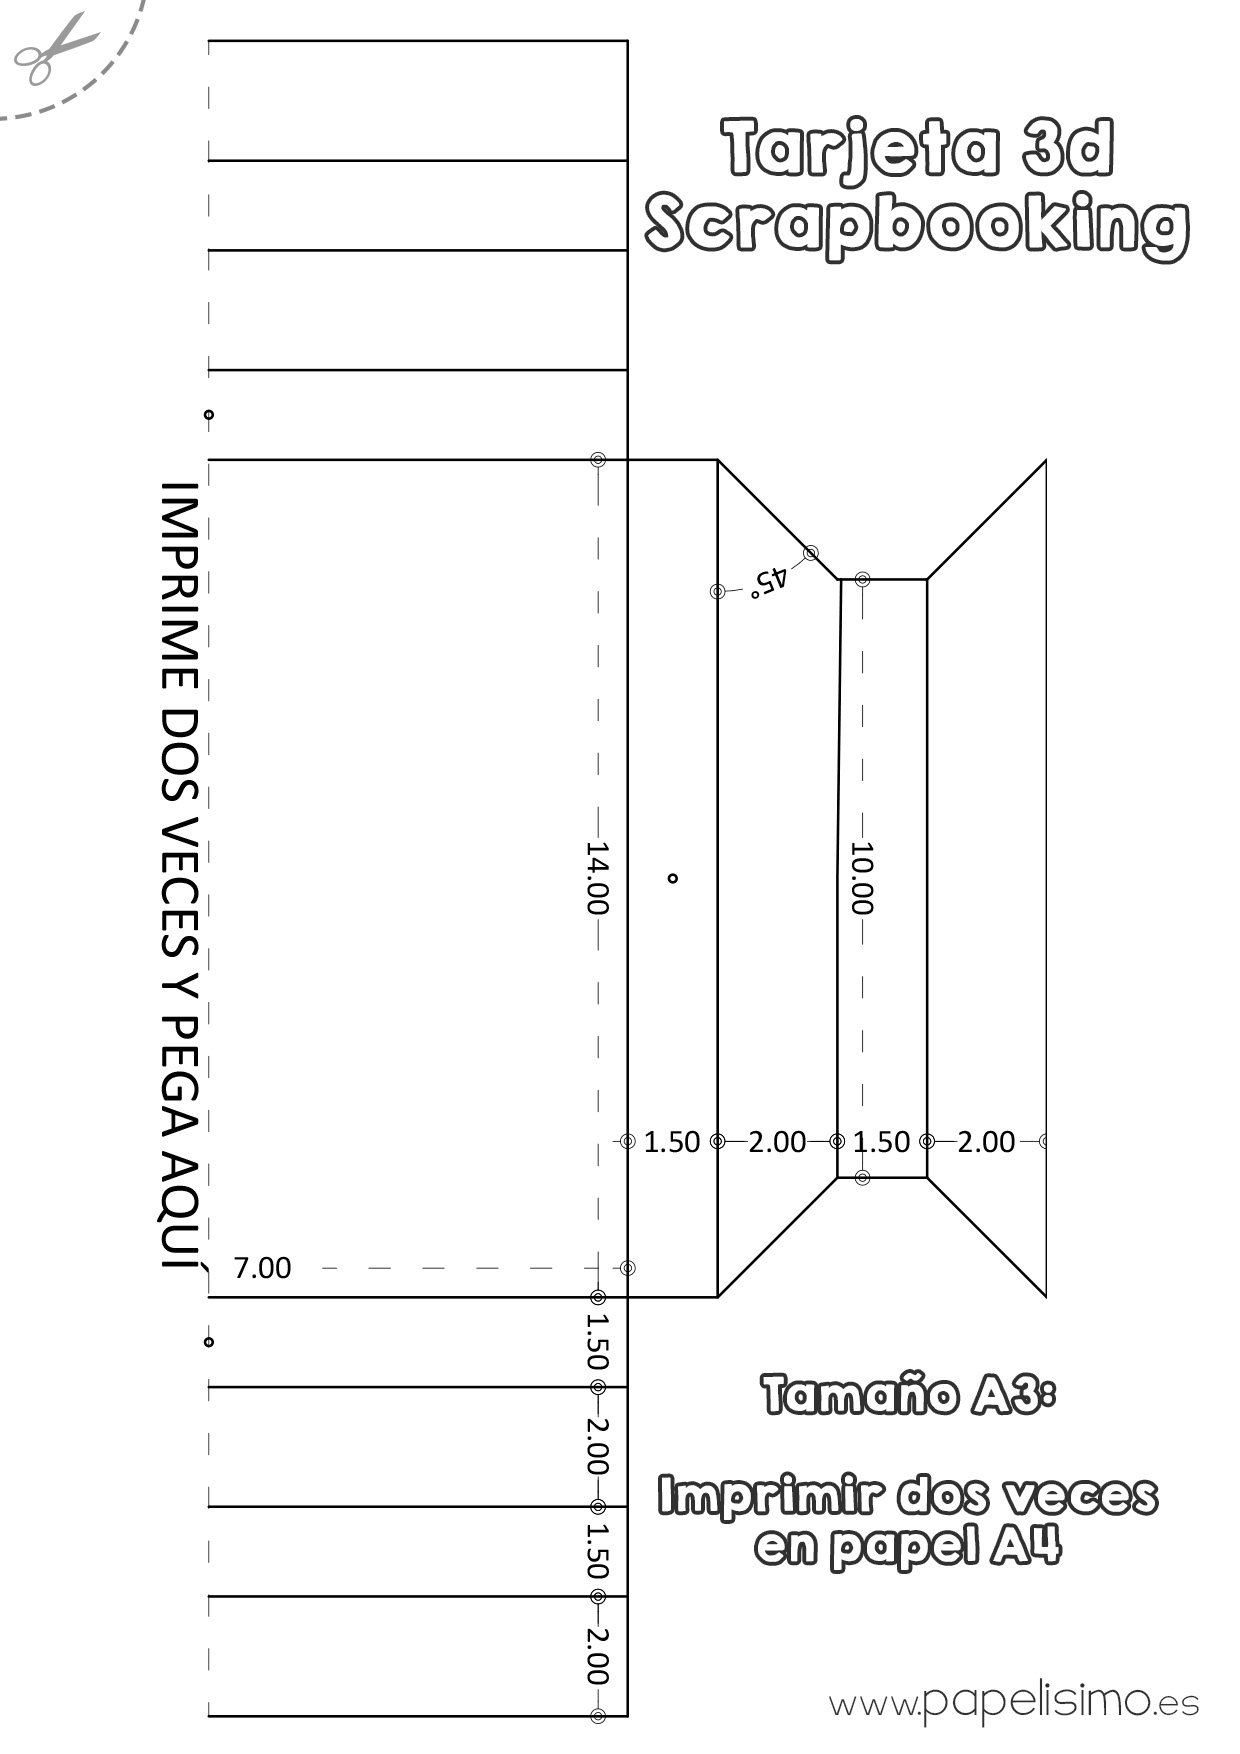 Tarjeta de cumpleaños 3D Scrapbooking - PAPELISIMO